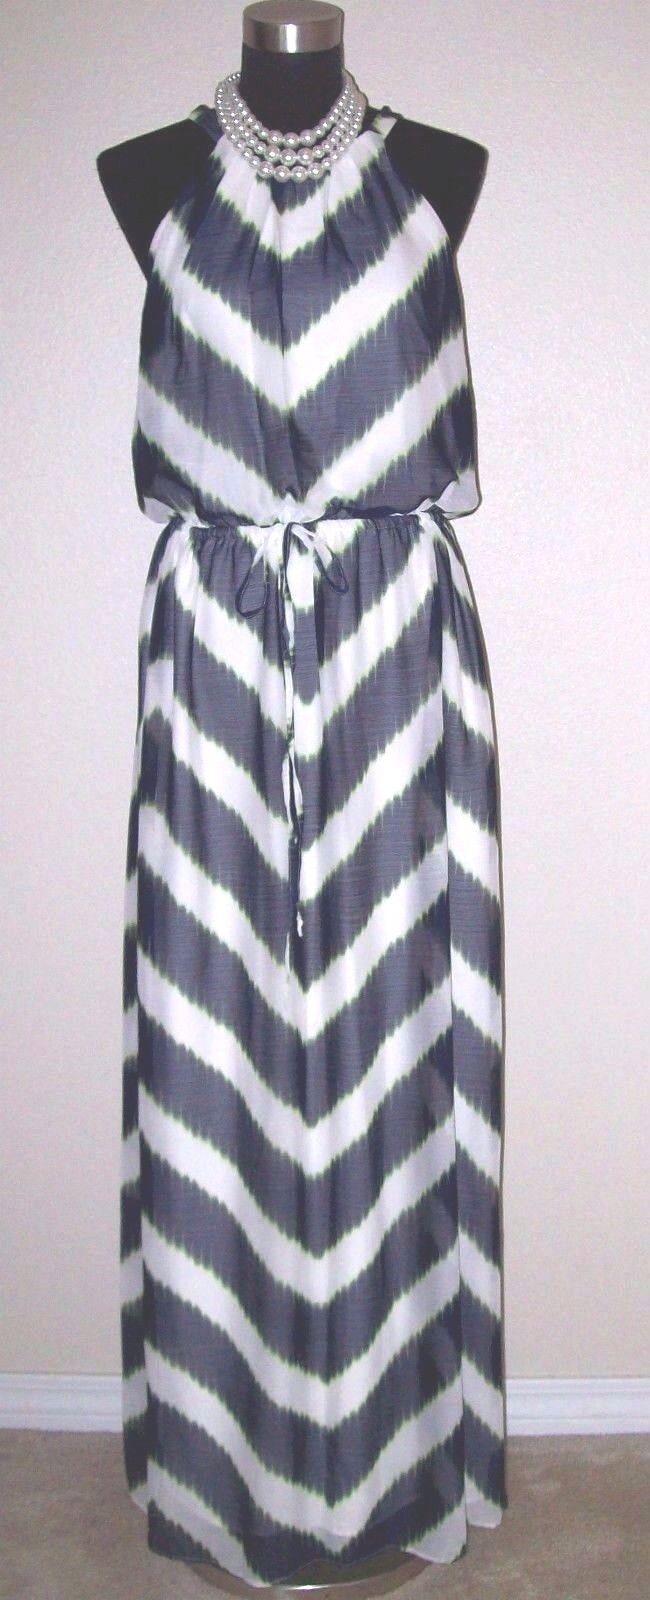 Vince Camuto Dress Sz 10 schwarz Grün & Off Weiß Maxi Drawstring M  NEW